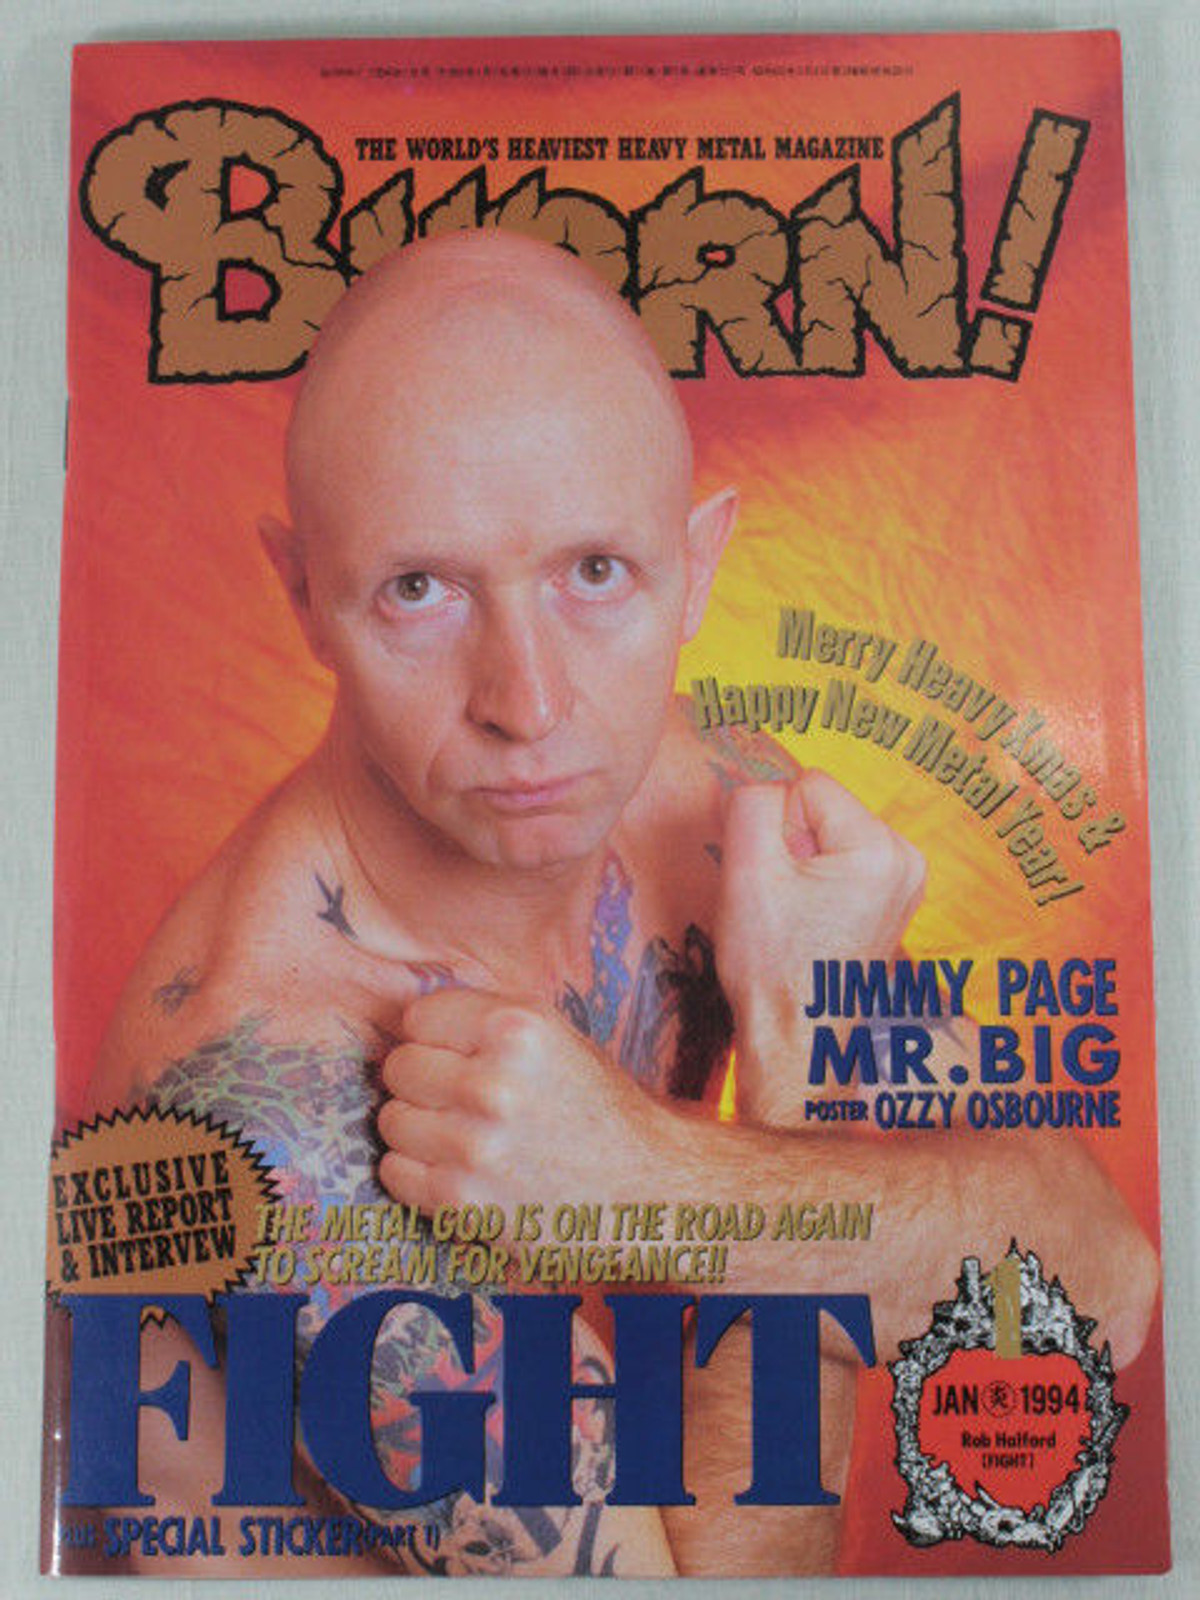 1994/01 BURRN! Japan Rock Magazine FIGHT/JIMMYPAGE/MR.BIG/RUSH/VAIN/W.A.S.P.